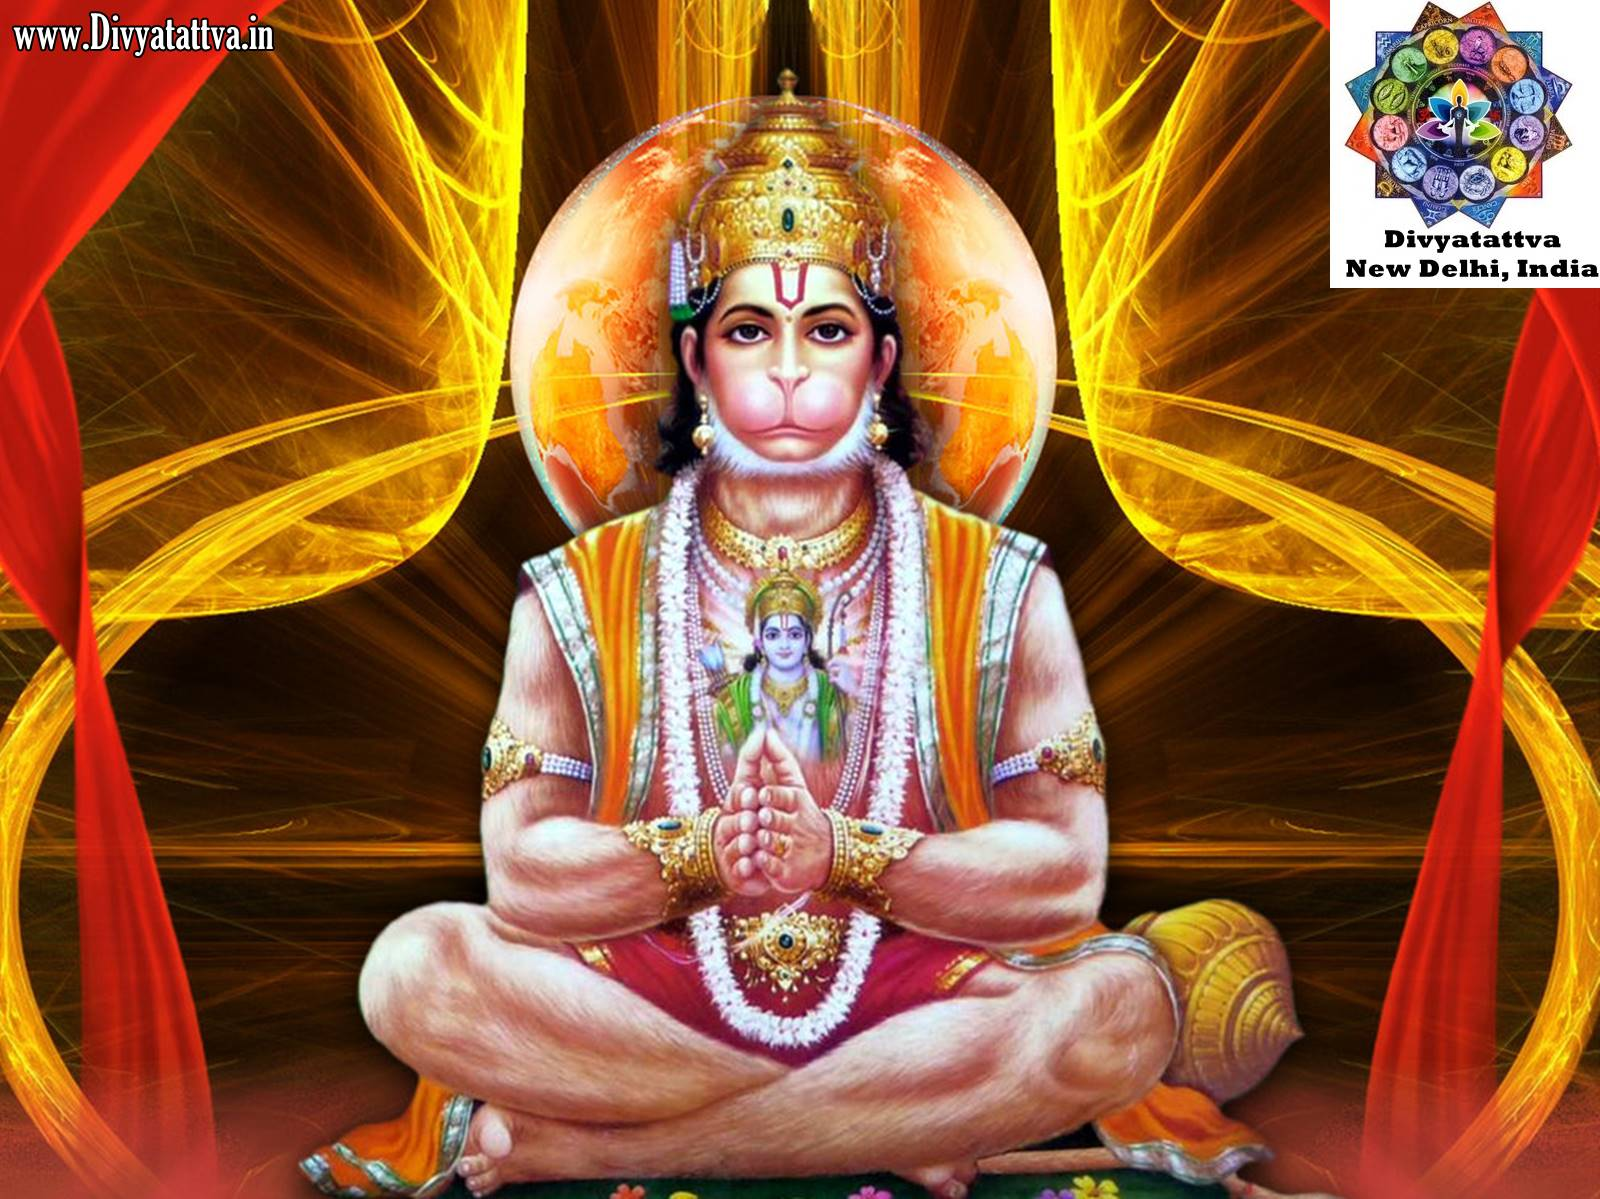 Top Wallpaper Lord Hindu - lord-hanuman-rama-bhakt-bajarang-bali-spiritual-god-wallpaper-hindu-god-background-divyatattva-rohit-anand  Graphic_989689.jpg